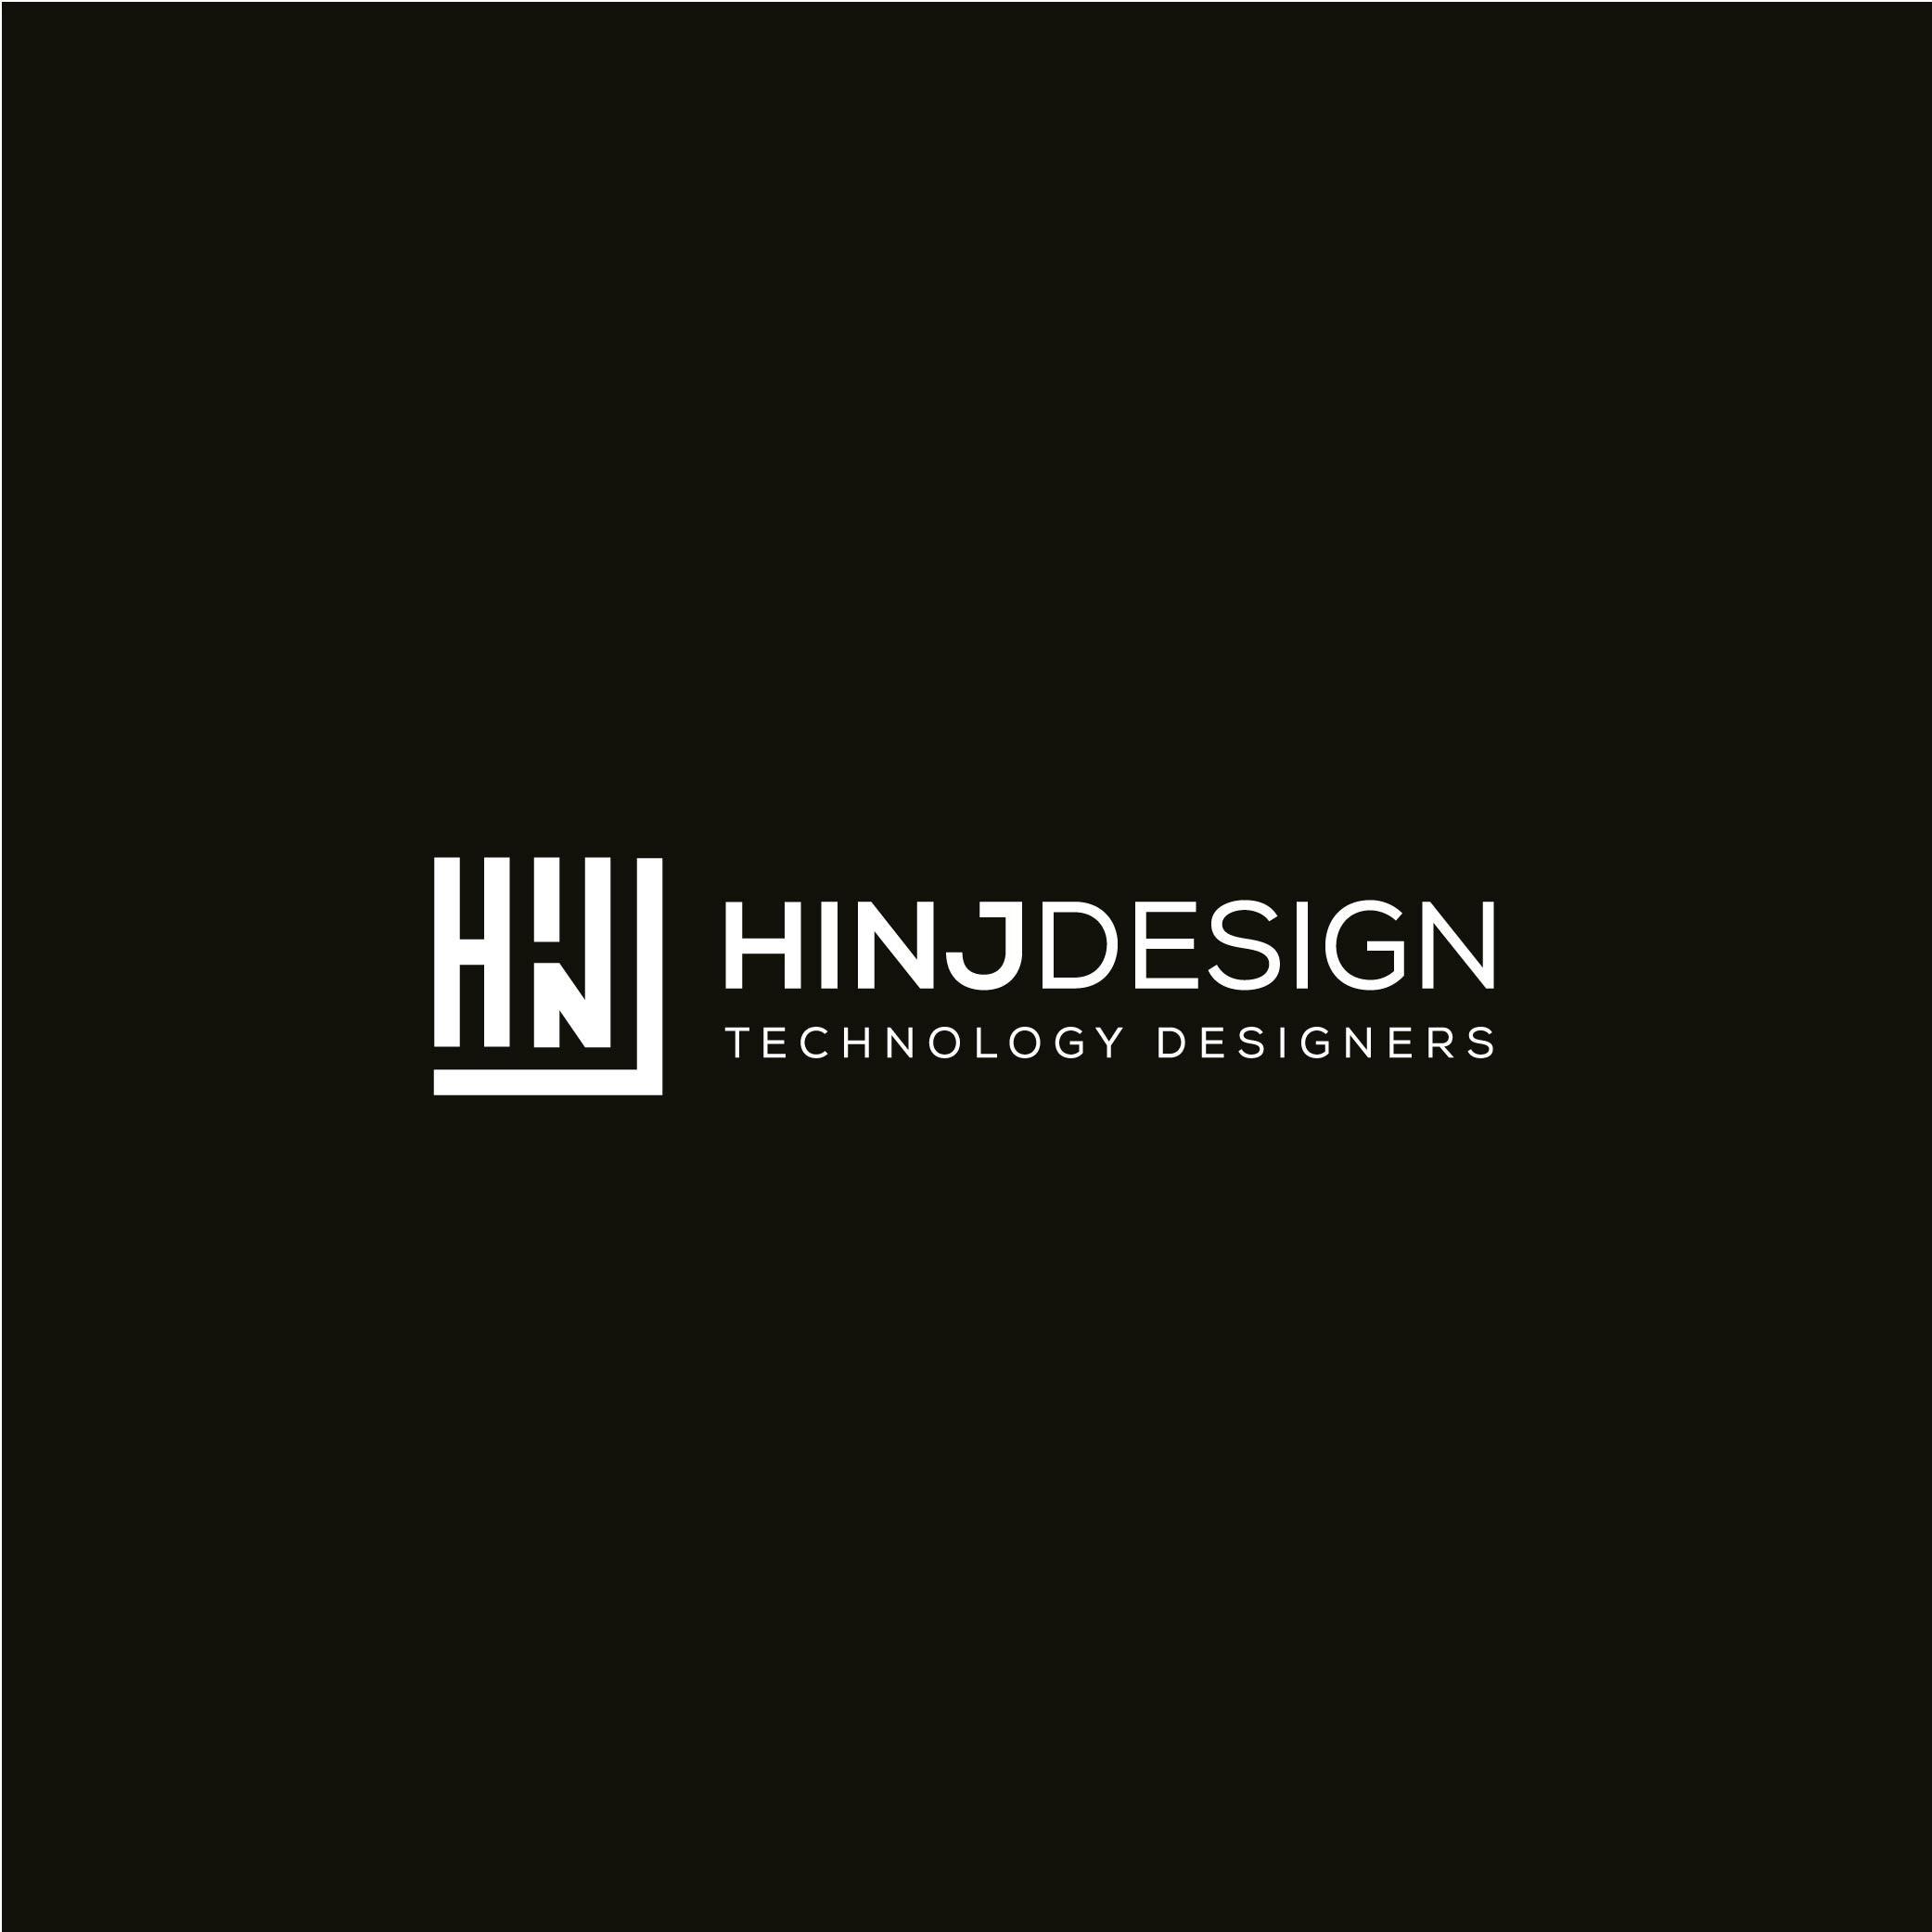 Technology Designer needs catchy but sophisticated Logo